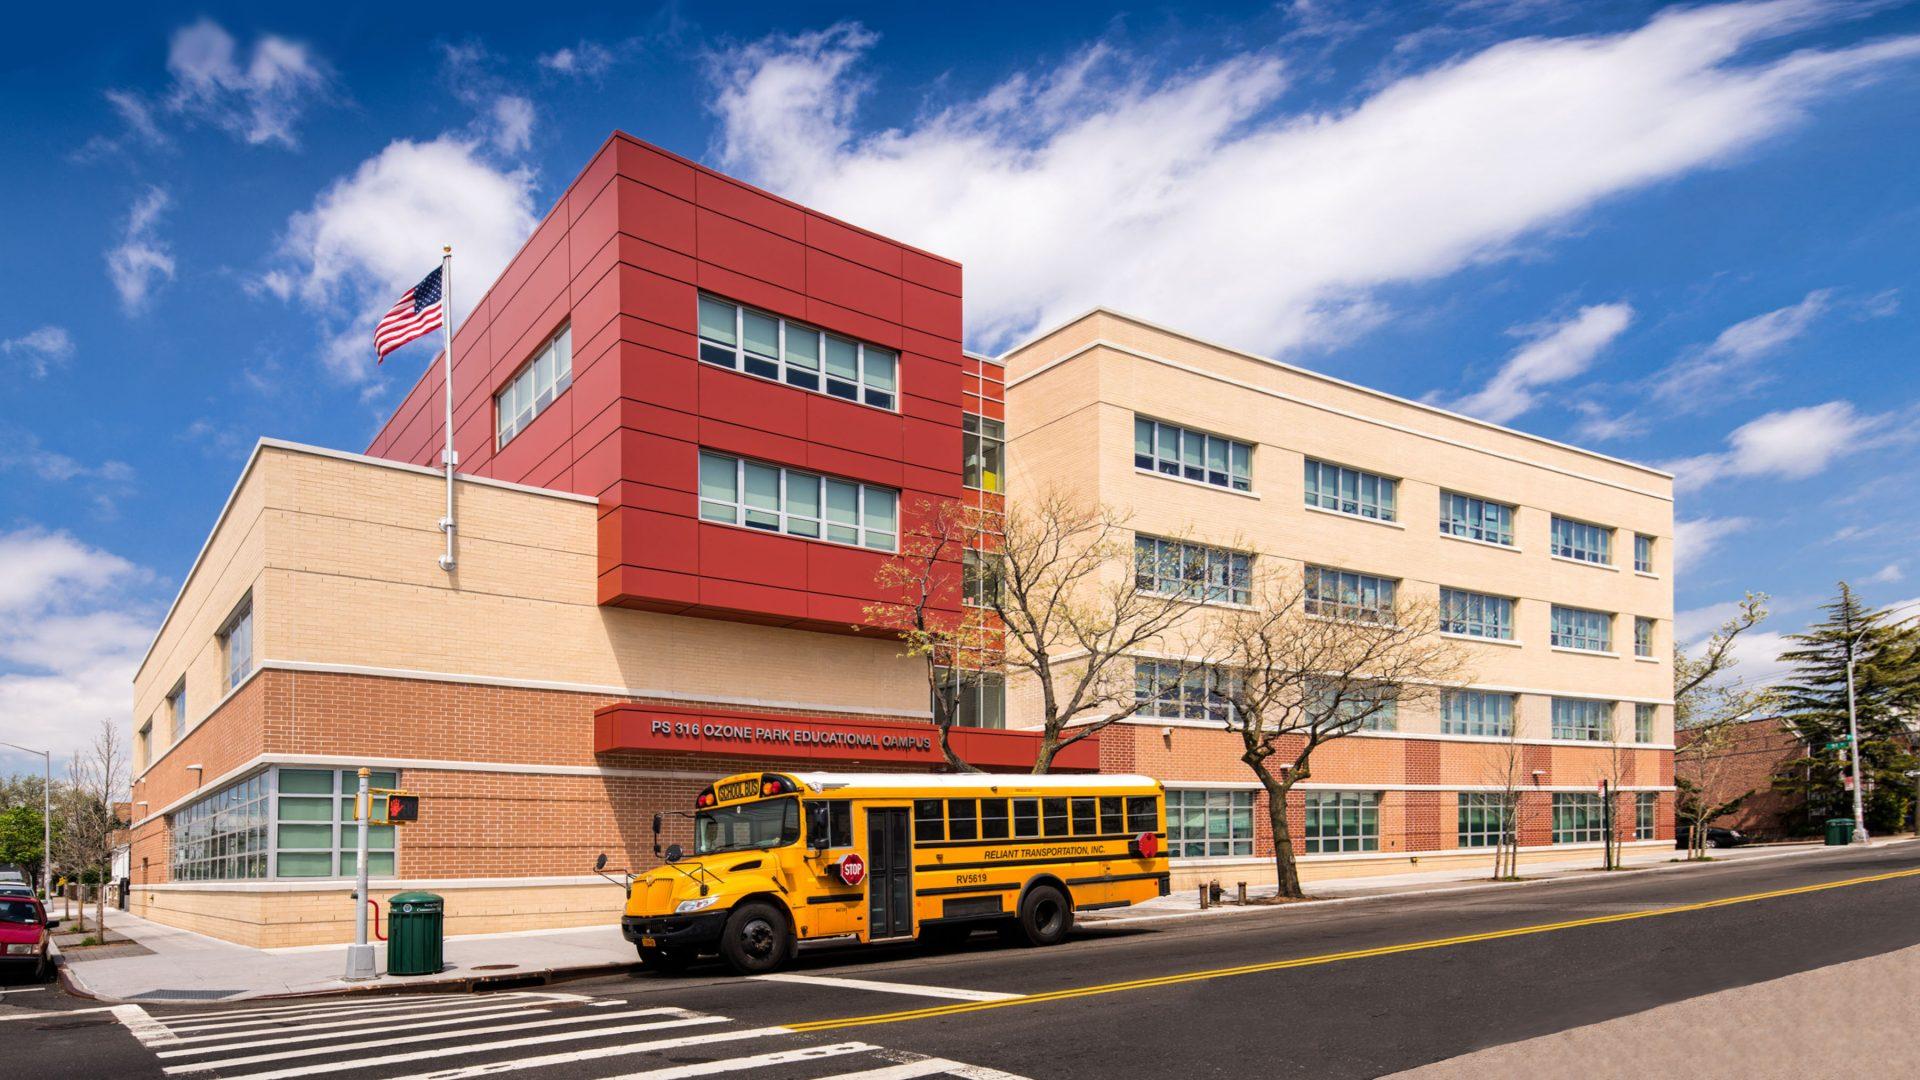 Public School 316